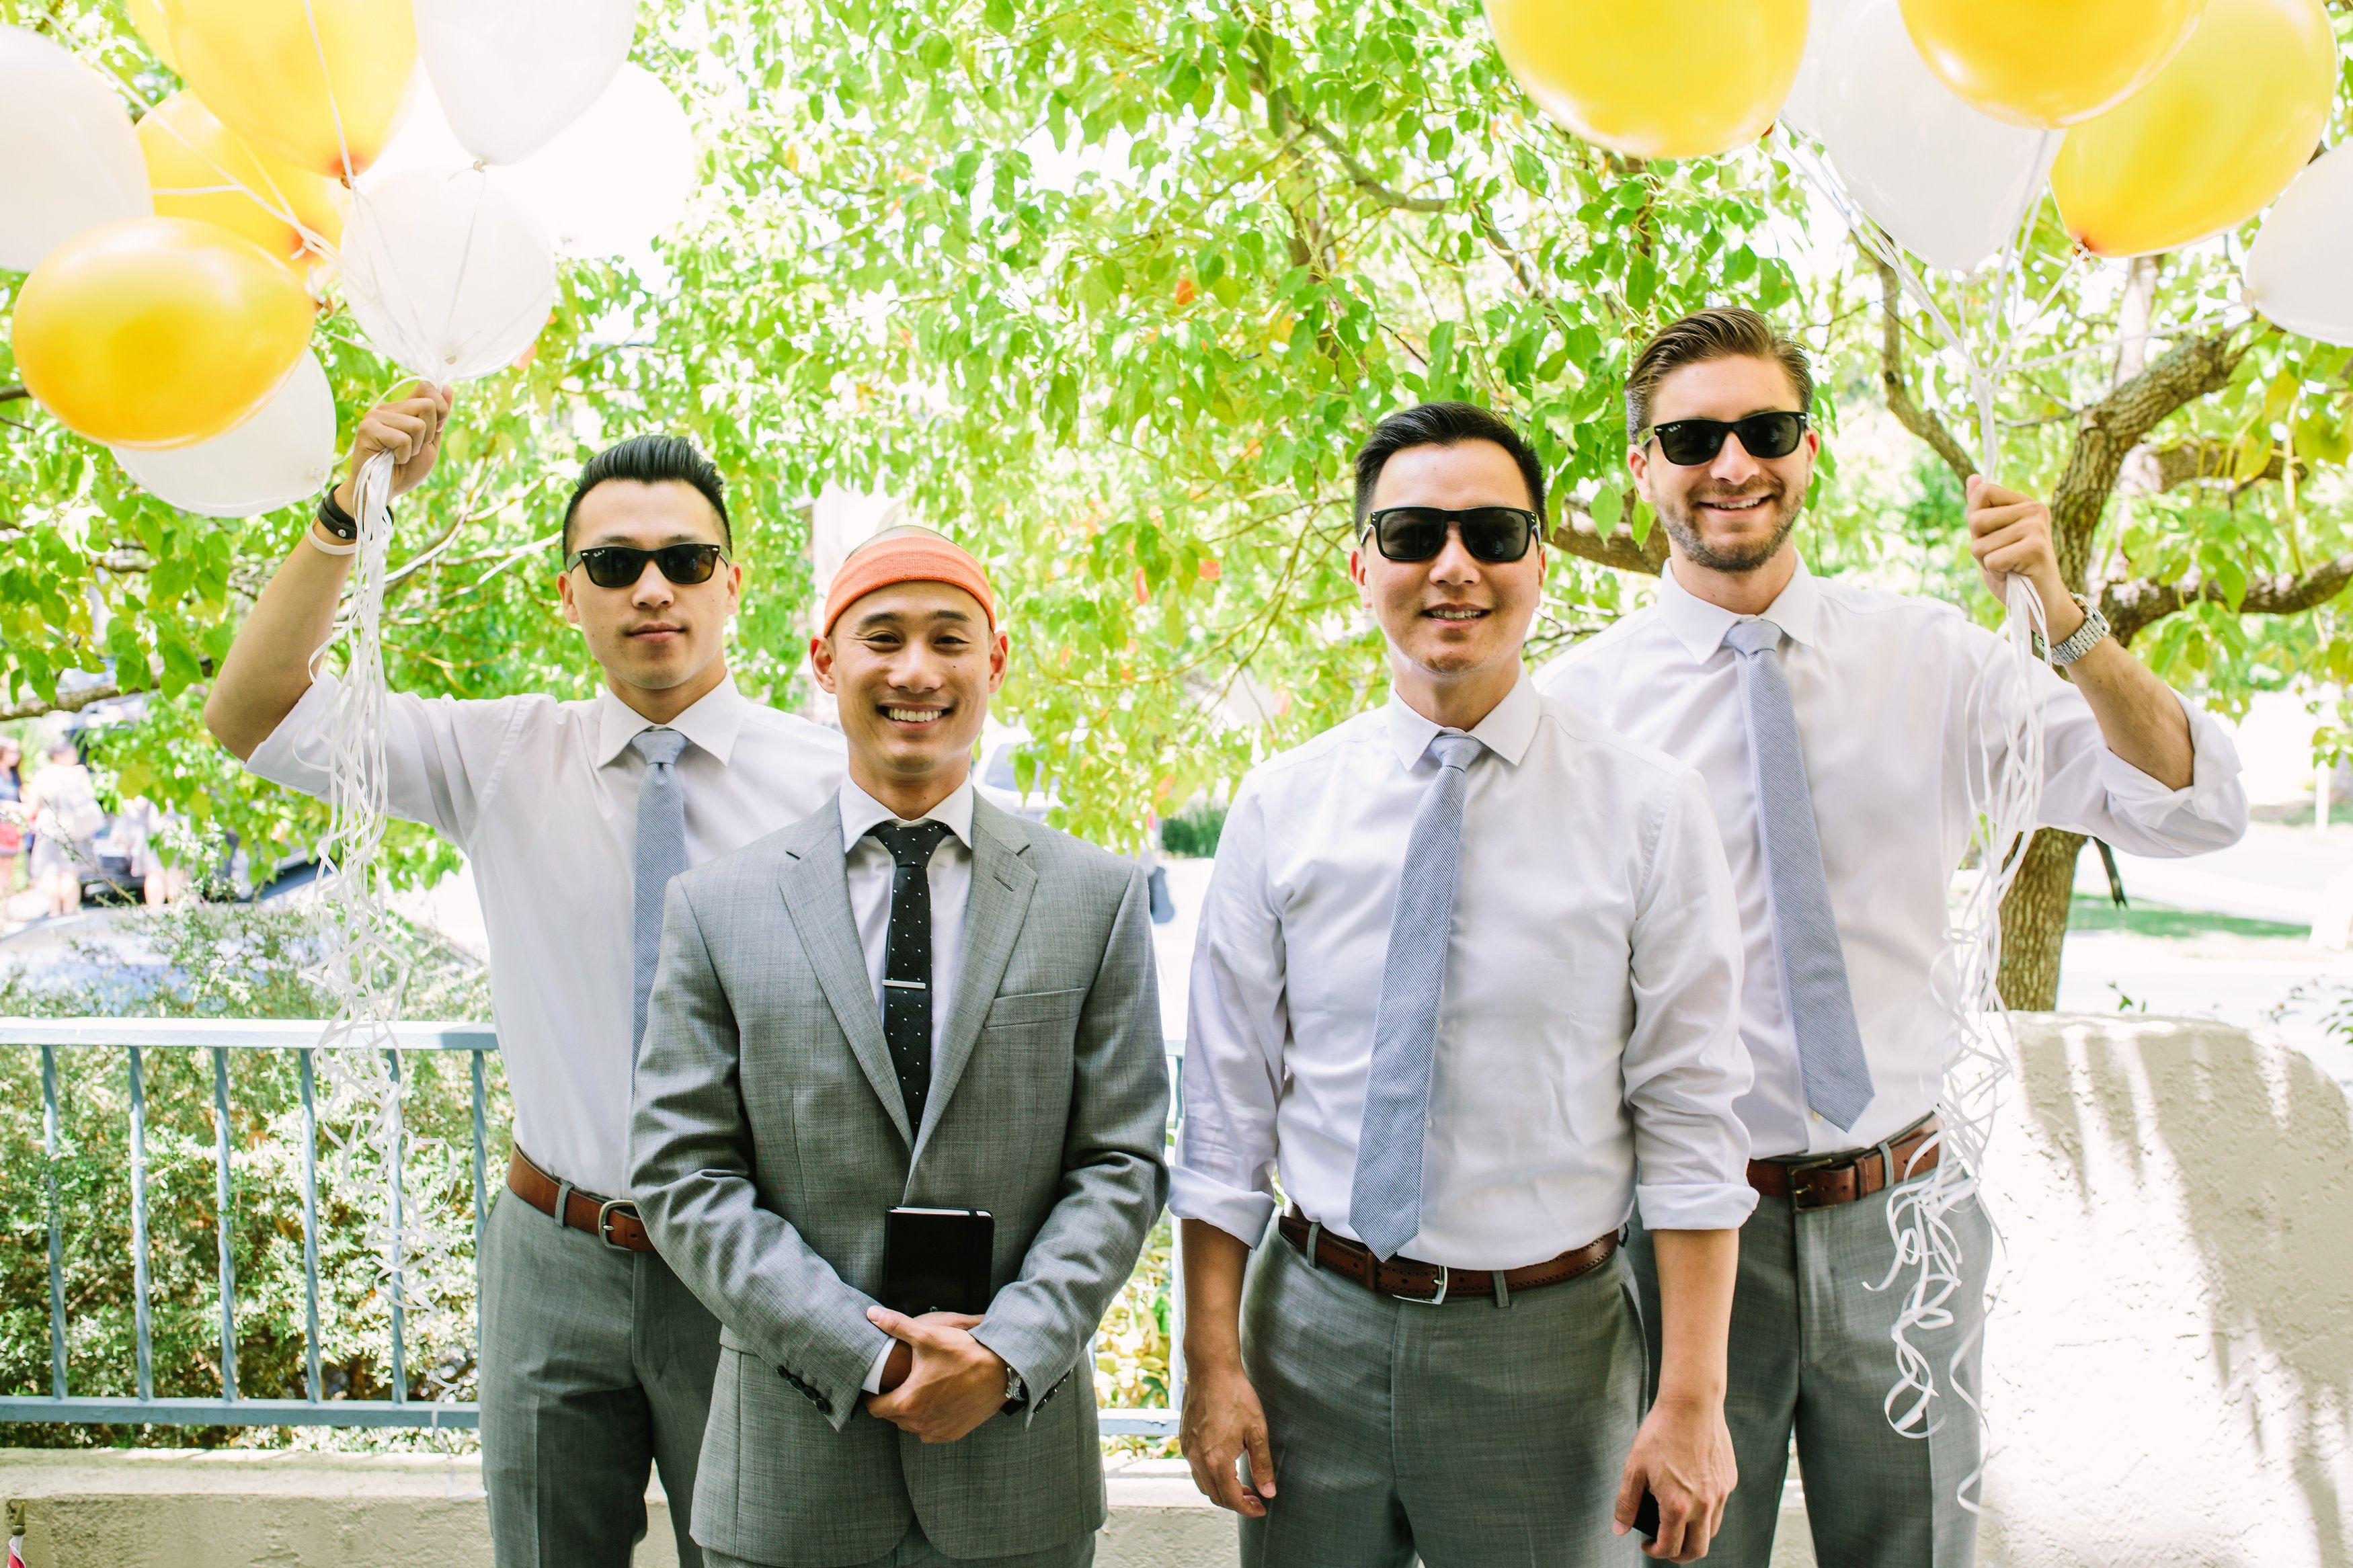 Sarah & Nathan's Redwood Picnic Wedding at Huddart Park in Woodside, California. See more: http://bit.ly/1O6HQH6 || Pop Fizz Weddings || Denver, Colorado